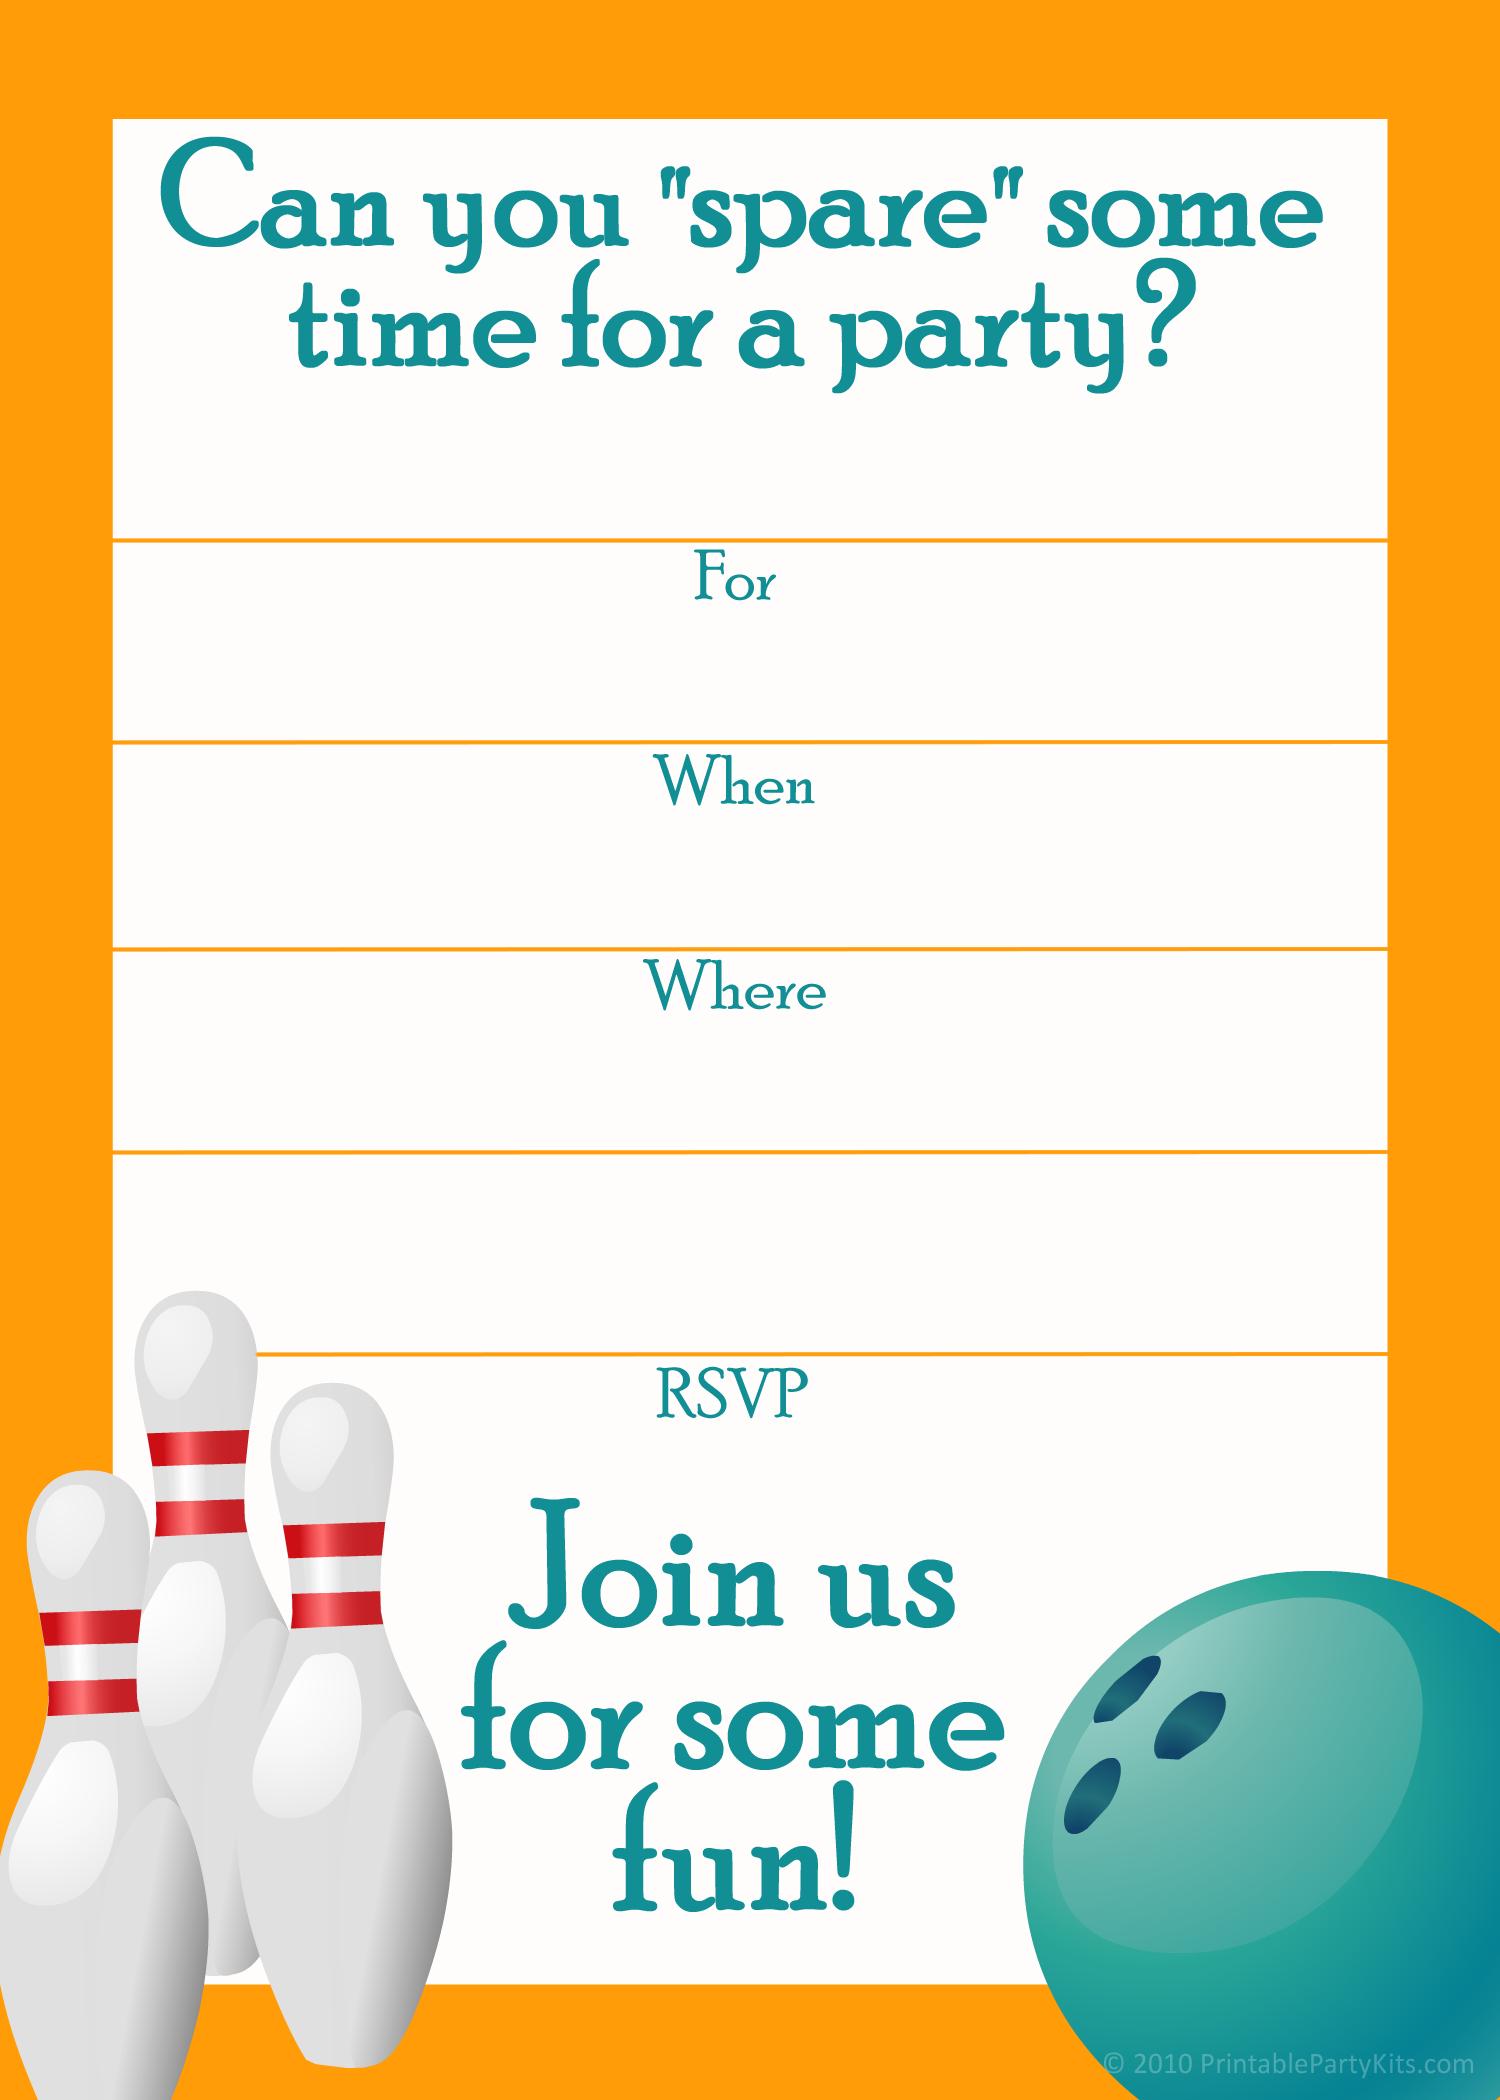 Free Printable Sports Birthday Party Invitations Templates | Party - Free Printable Sports Birthday Invitation Templates